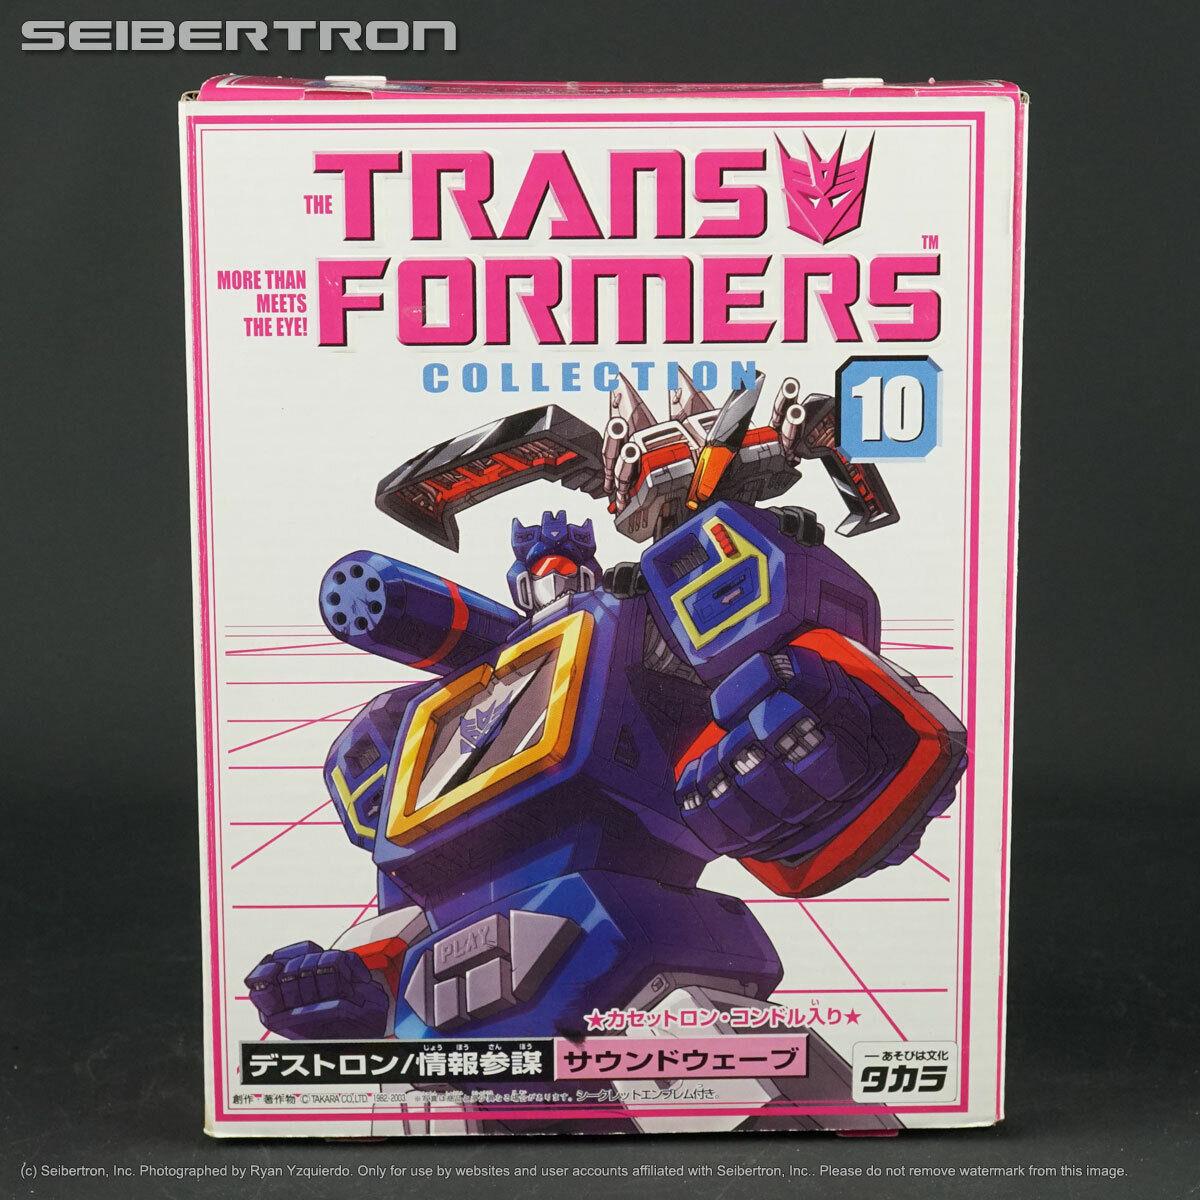 Soundwave Laserbeak Colección De Transformers 10 Completa + G1 Takara 2003 BKY